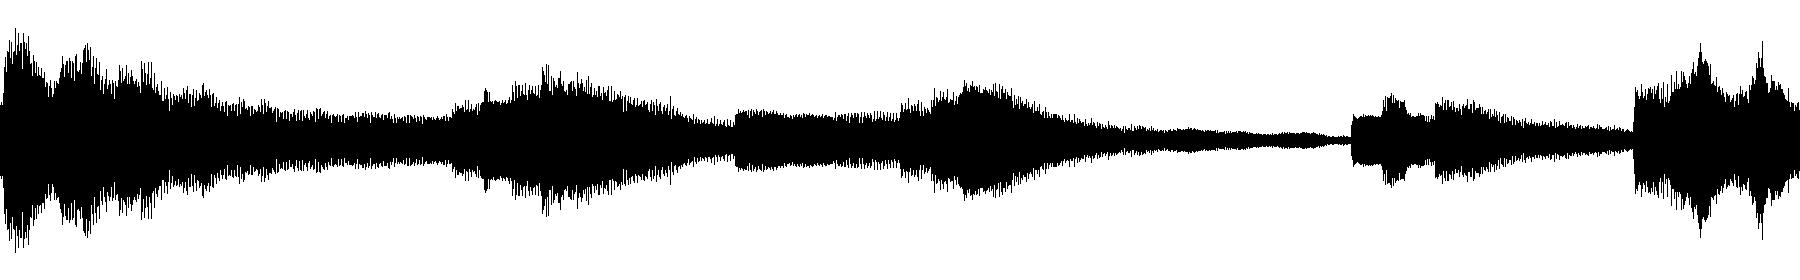 80 f piano mountainair 02